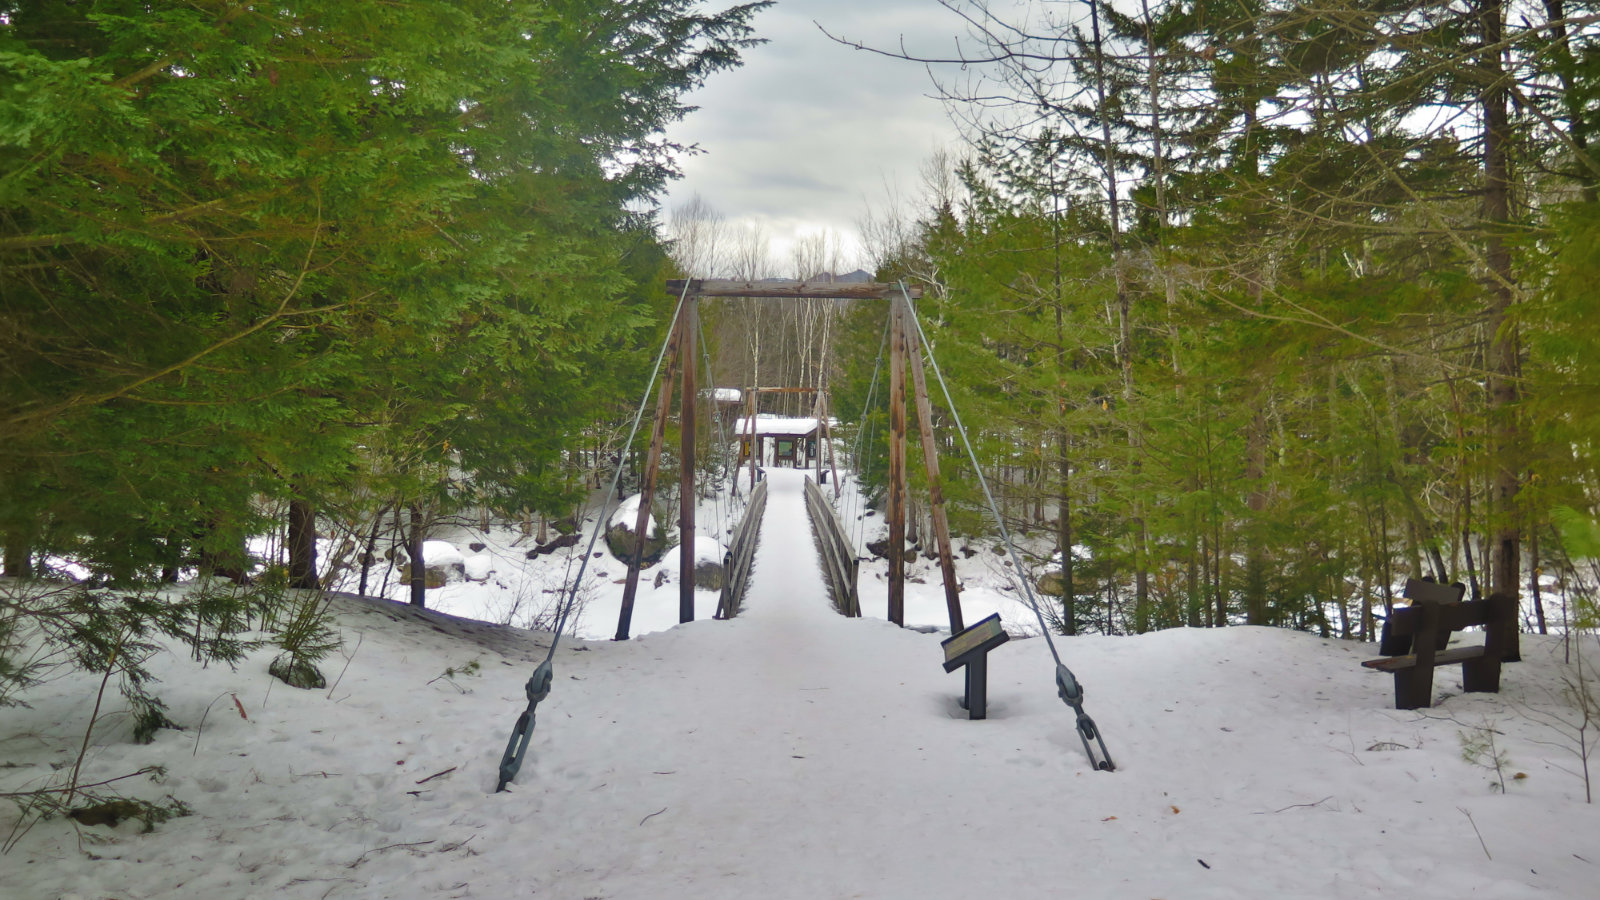 Pemi-East-Side-Suspension-Bridge-20200303